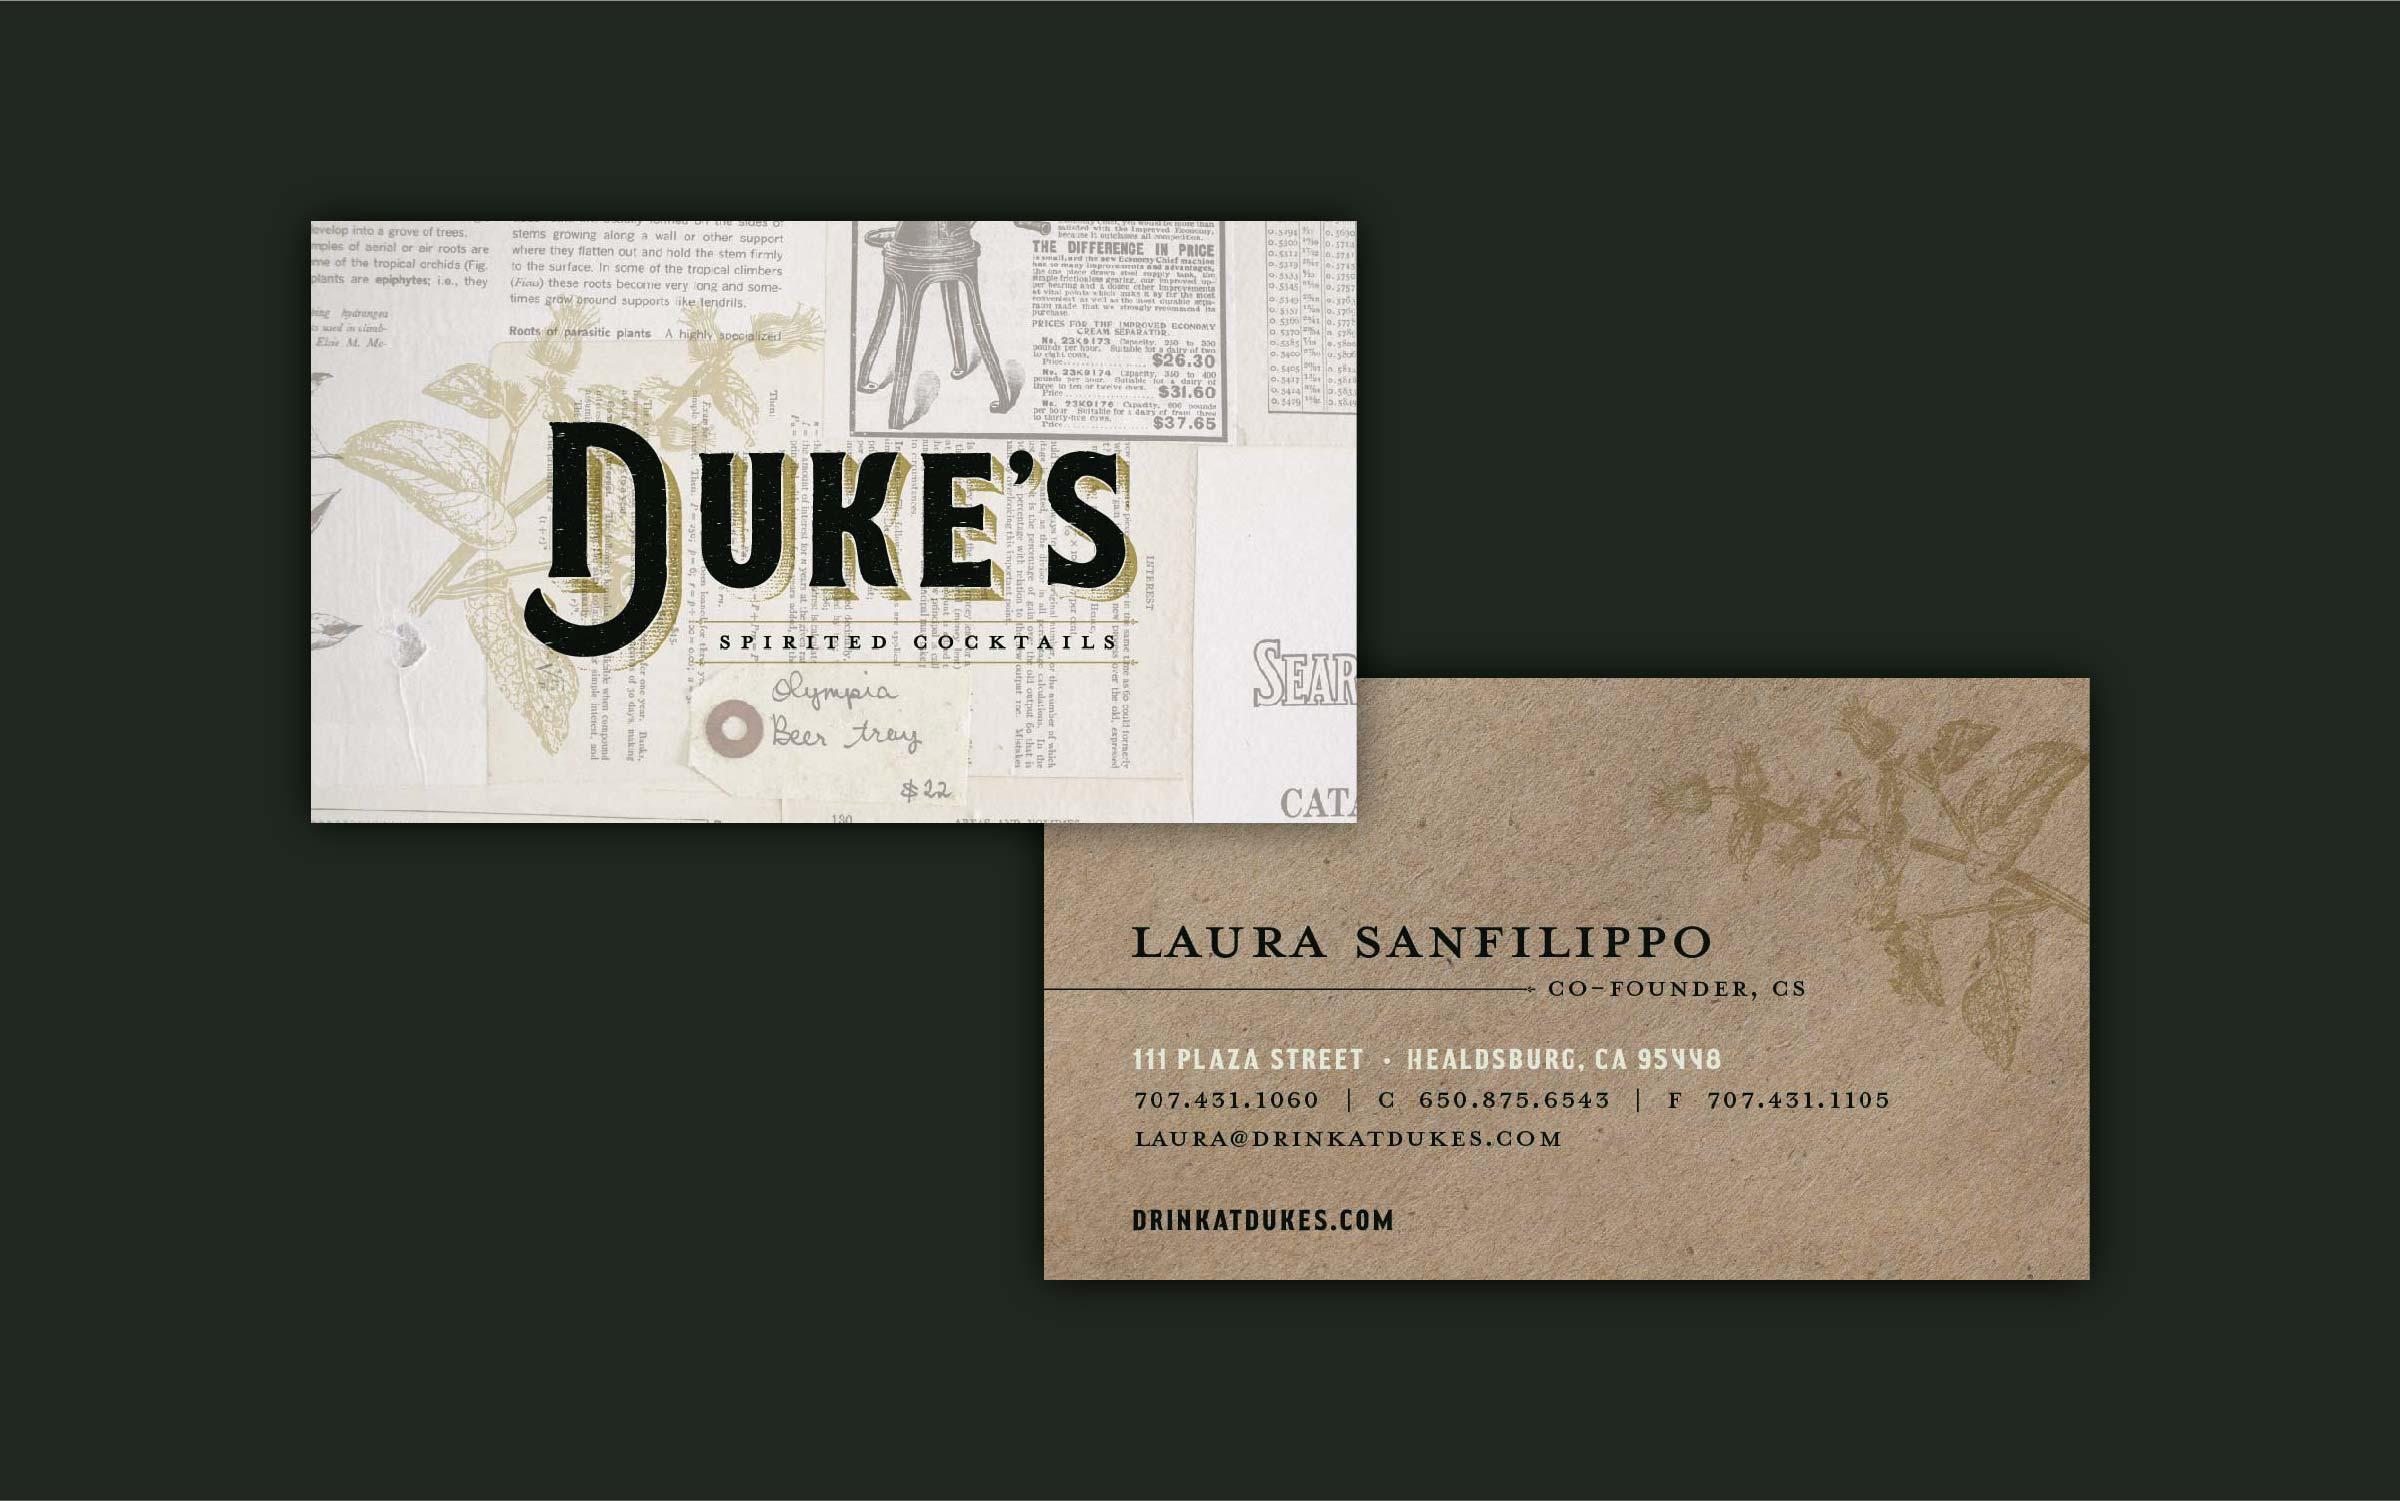 Dukes-Portfolio-2019-05.jpg